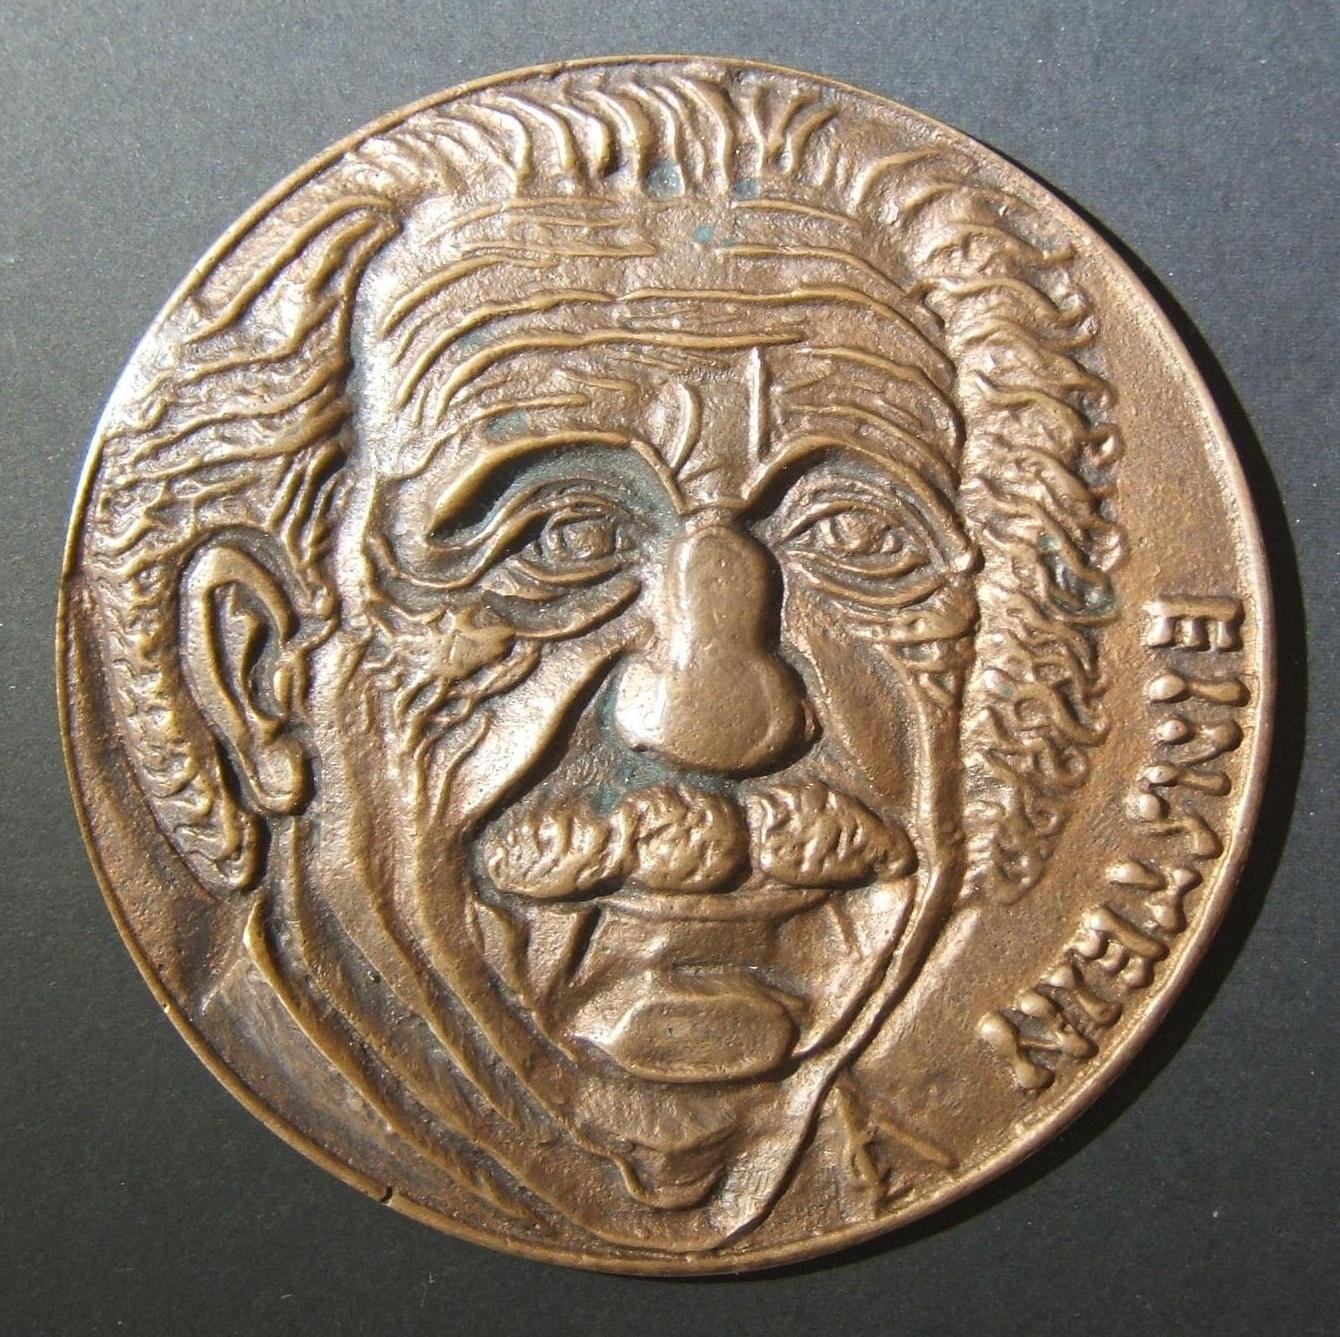 Hungarian Albert Einstein large uniface bronze Judaica medal by Laszlo Csontos